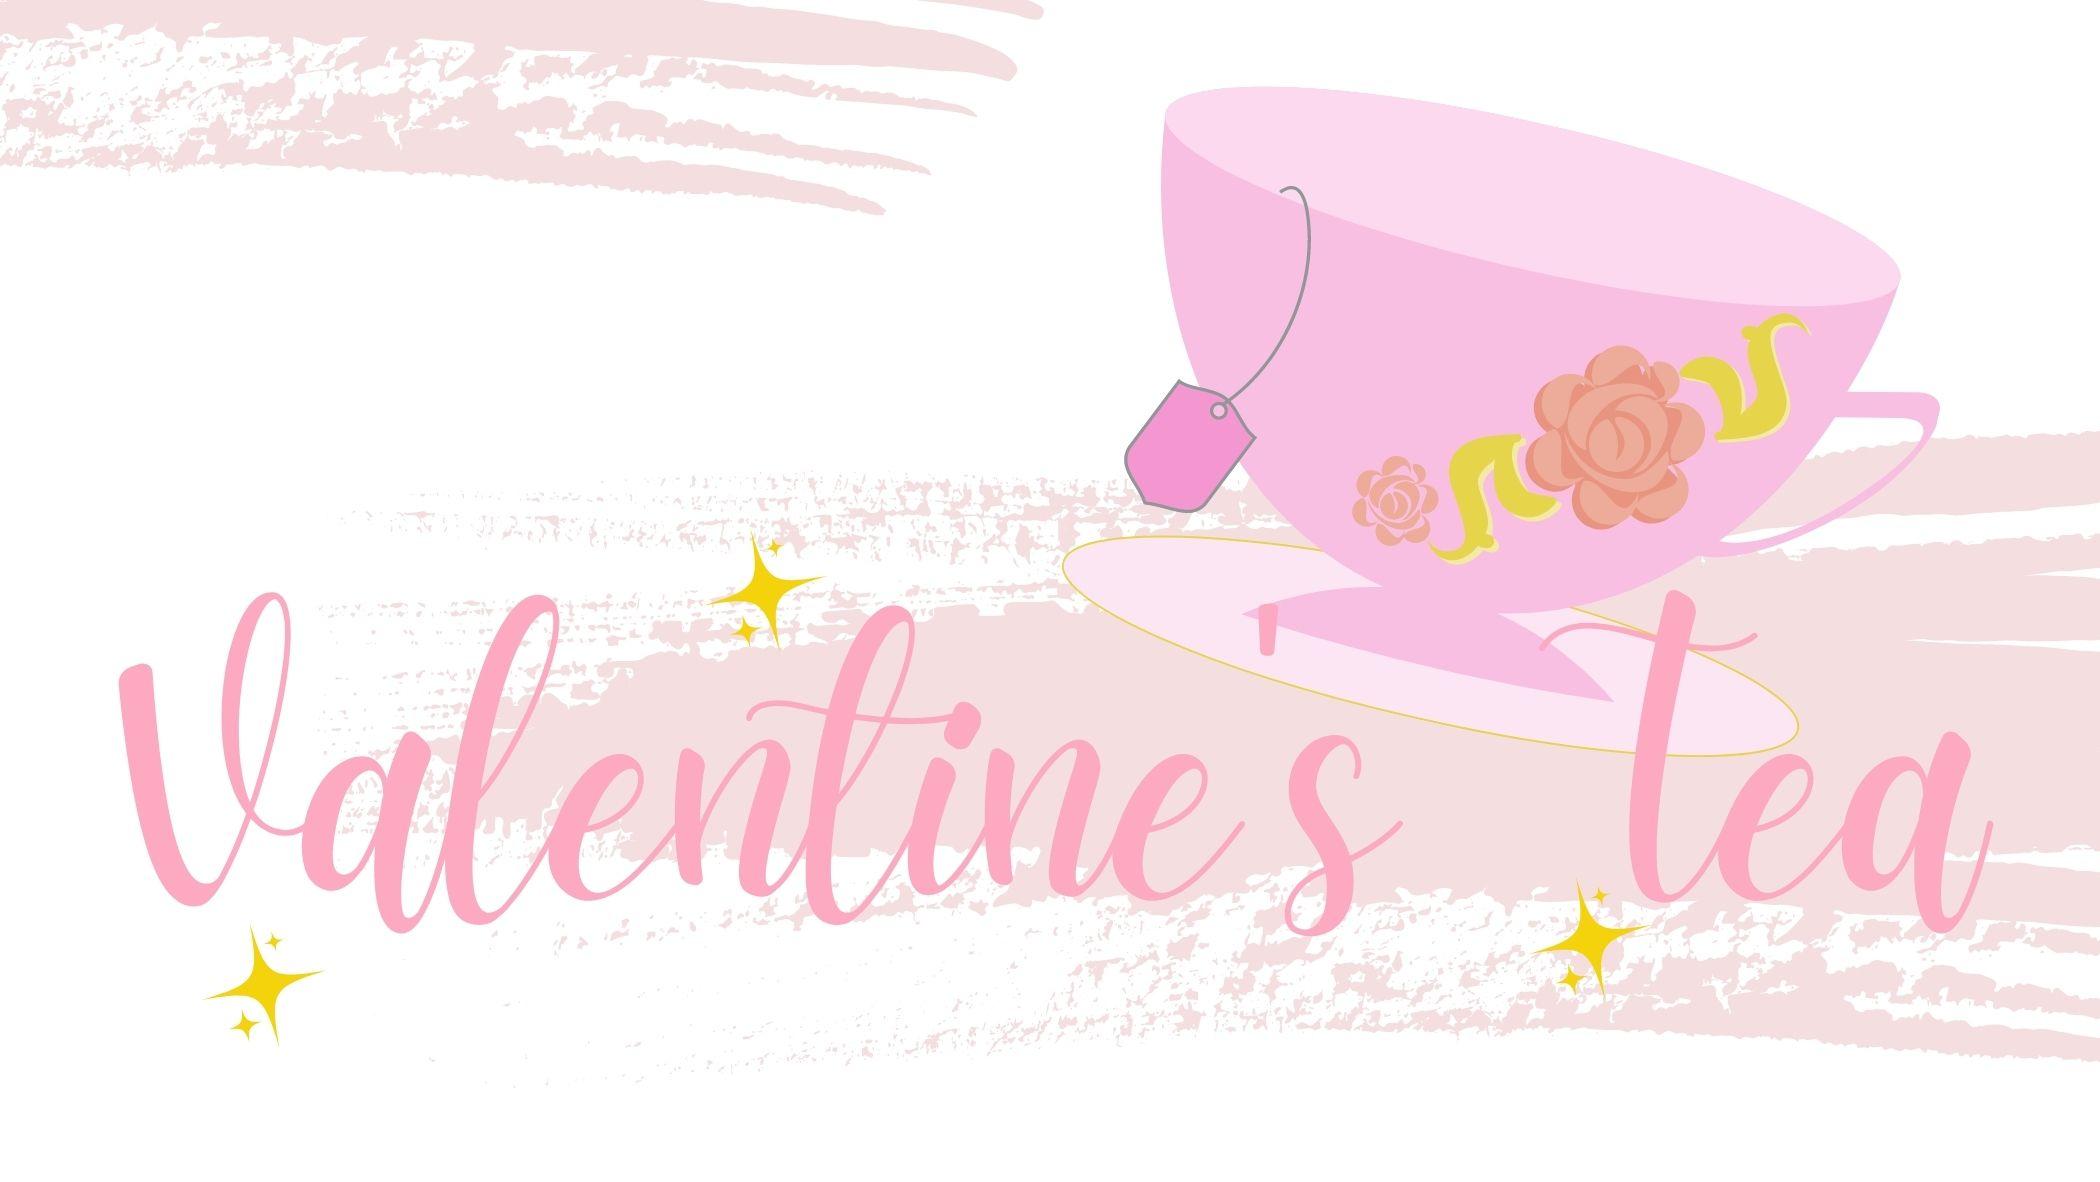 Valentine's Tea Blog